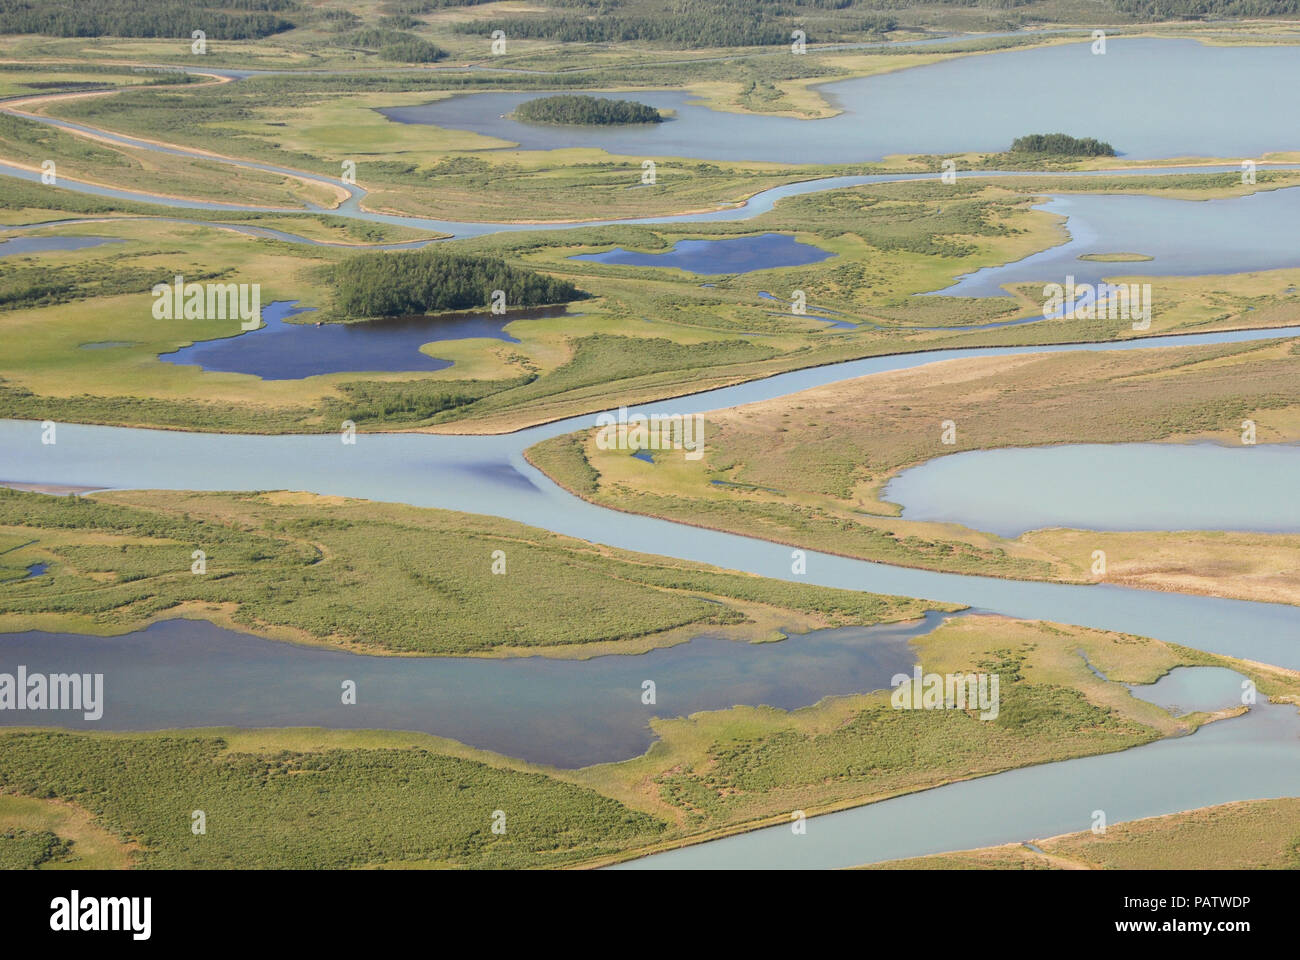 The Beauty of Northern Sweden  - Rapaätno delta (remastered). Rapaätno delta, Sarek, Northern Sweden. 30.6.2009. Stock Photo